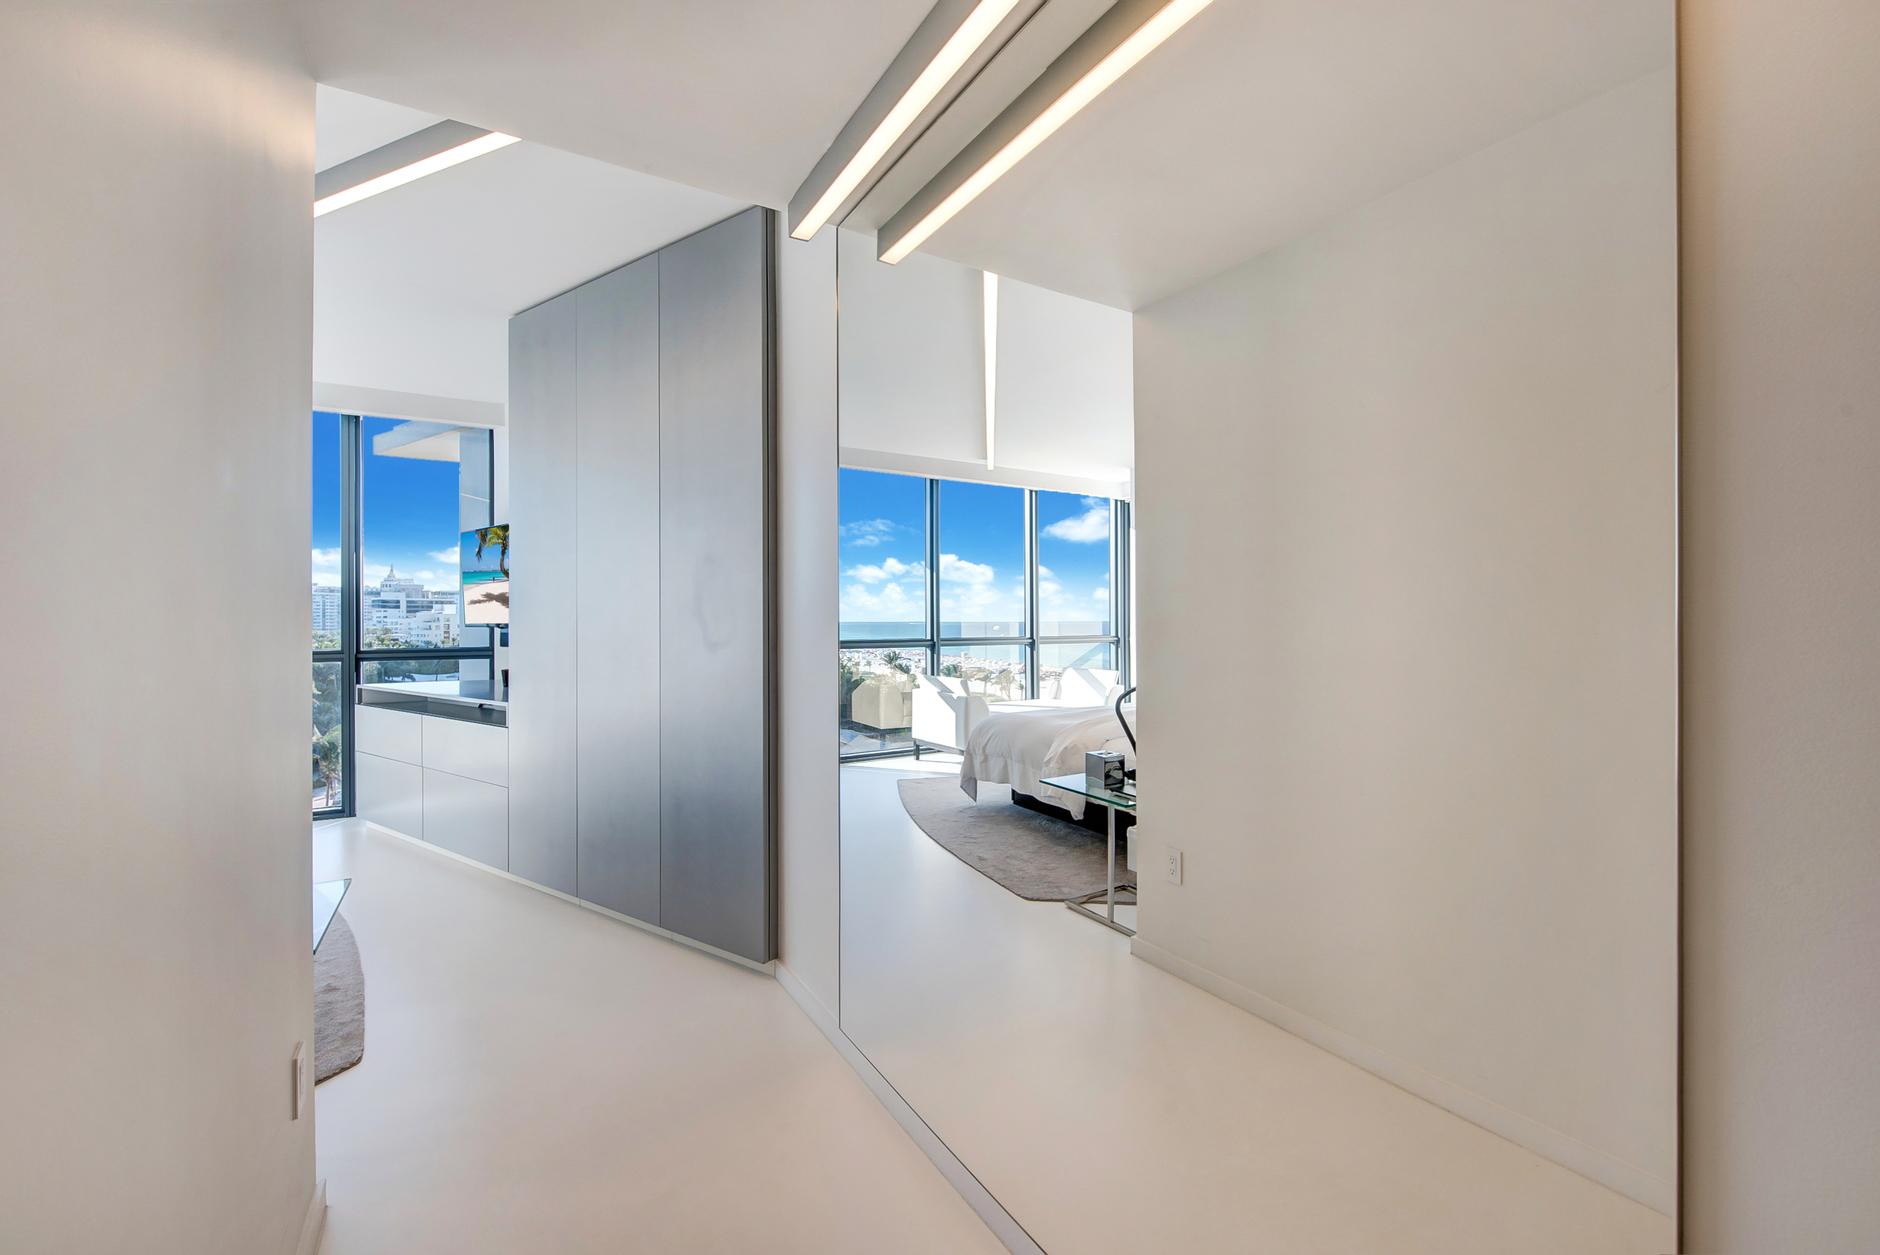 Квартира Захи Хадид в Майами продана за 5,75 млн долларов (галерея 6, фото 1)